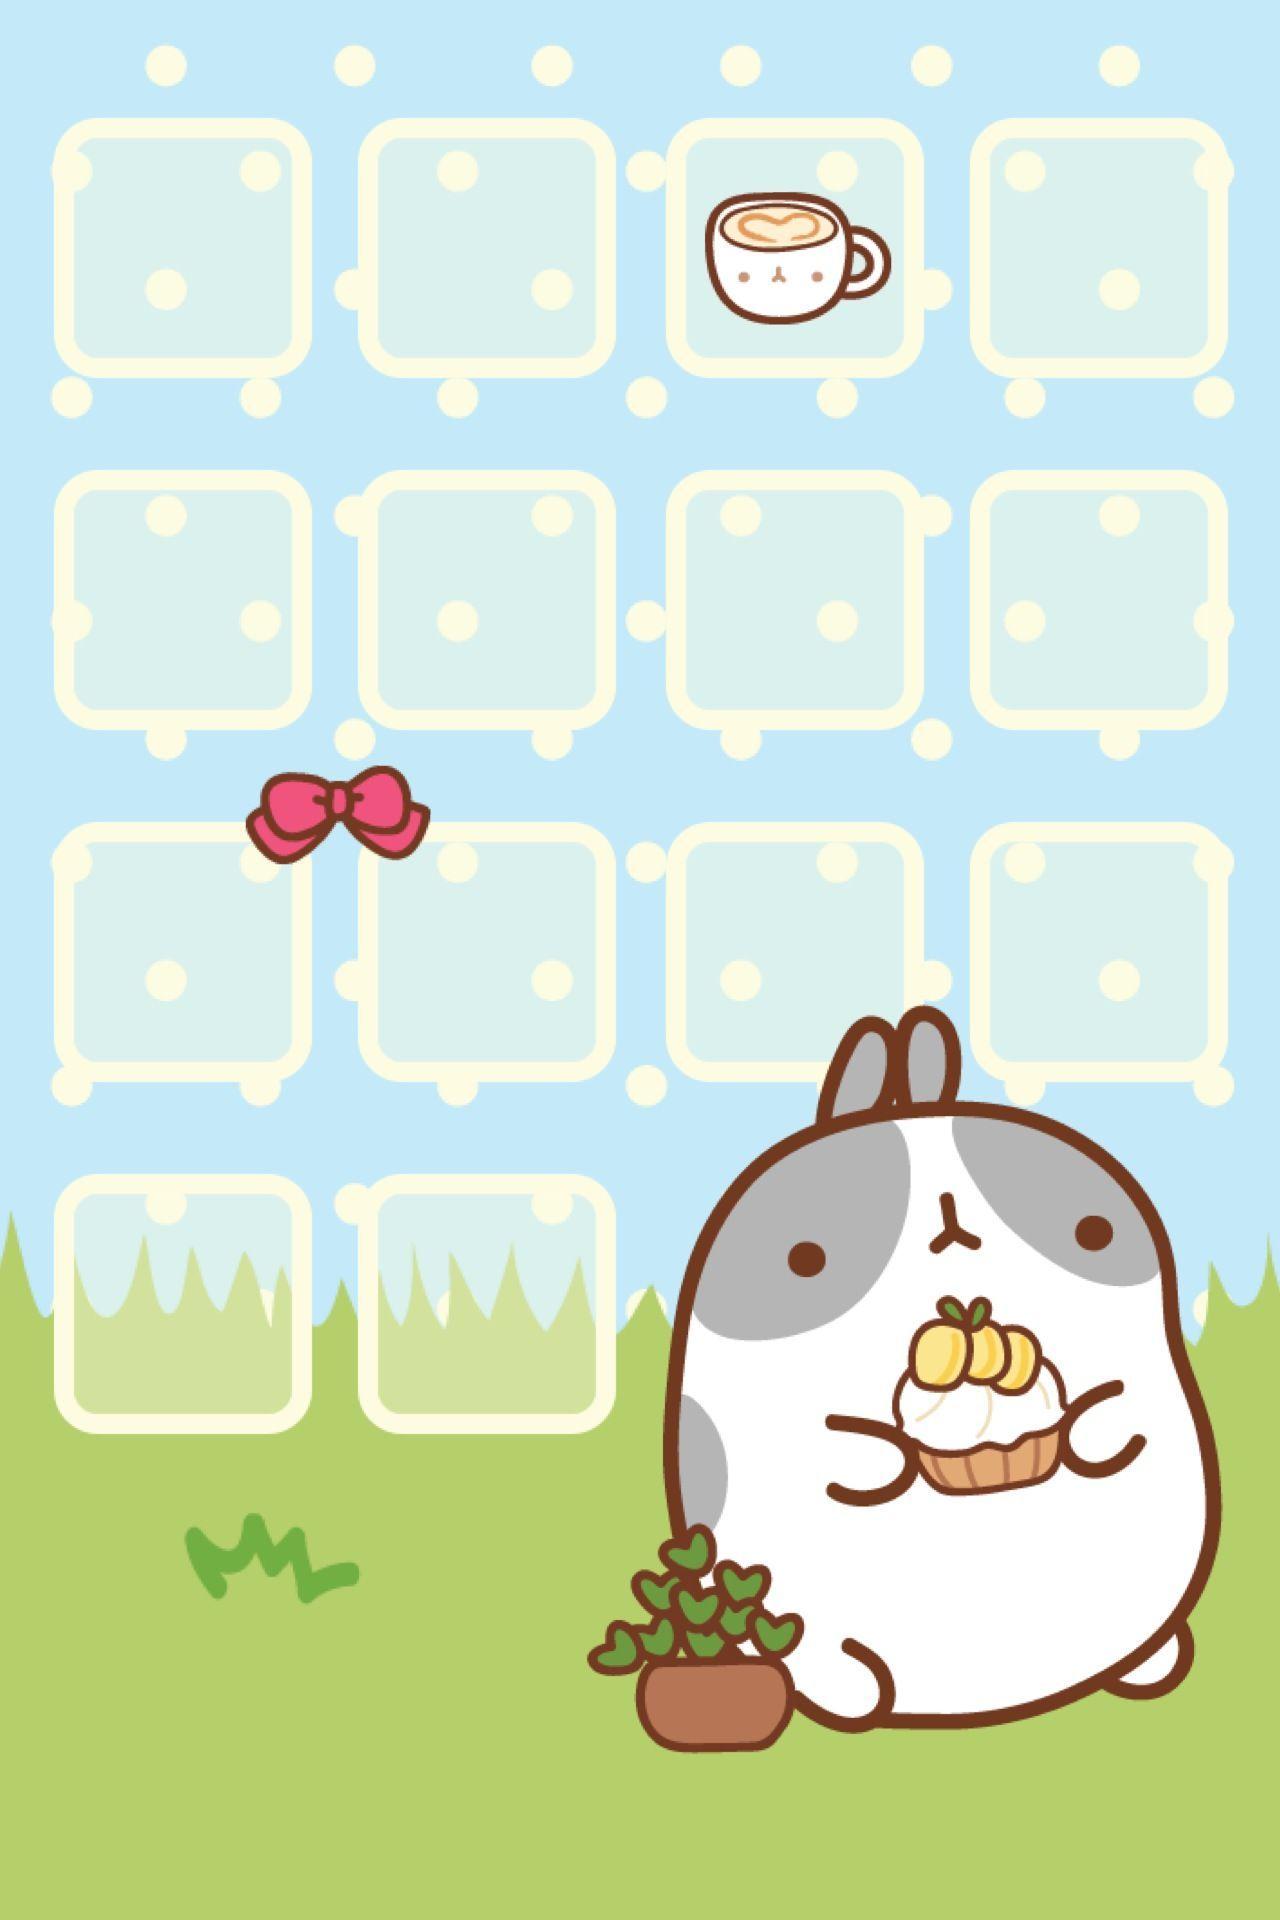 Kawaii iphone wallpaper tumblr - Iphone Wallpaper Tumblr Buana Wallpaper Zone